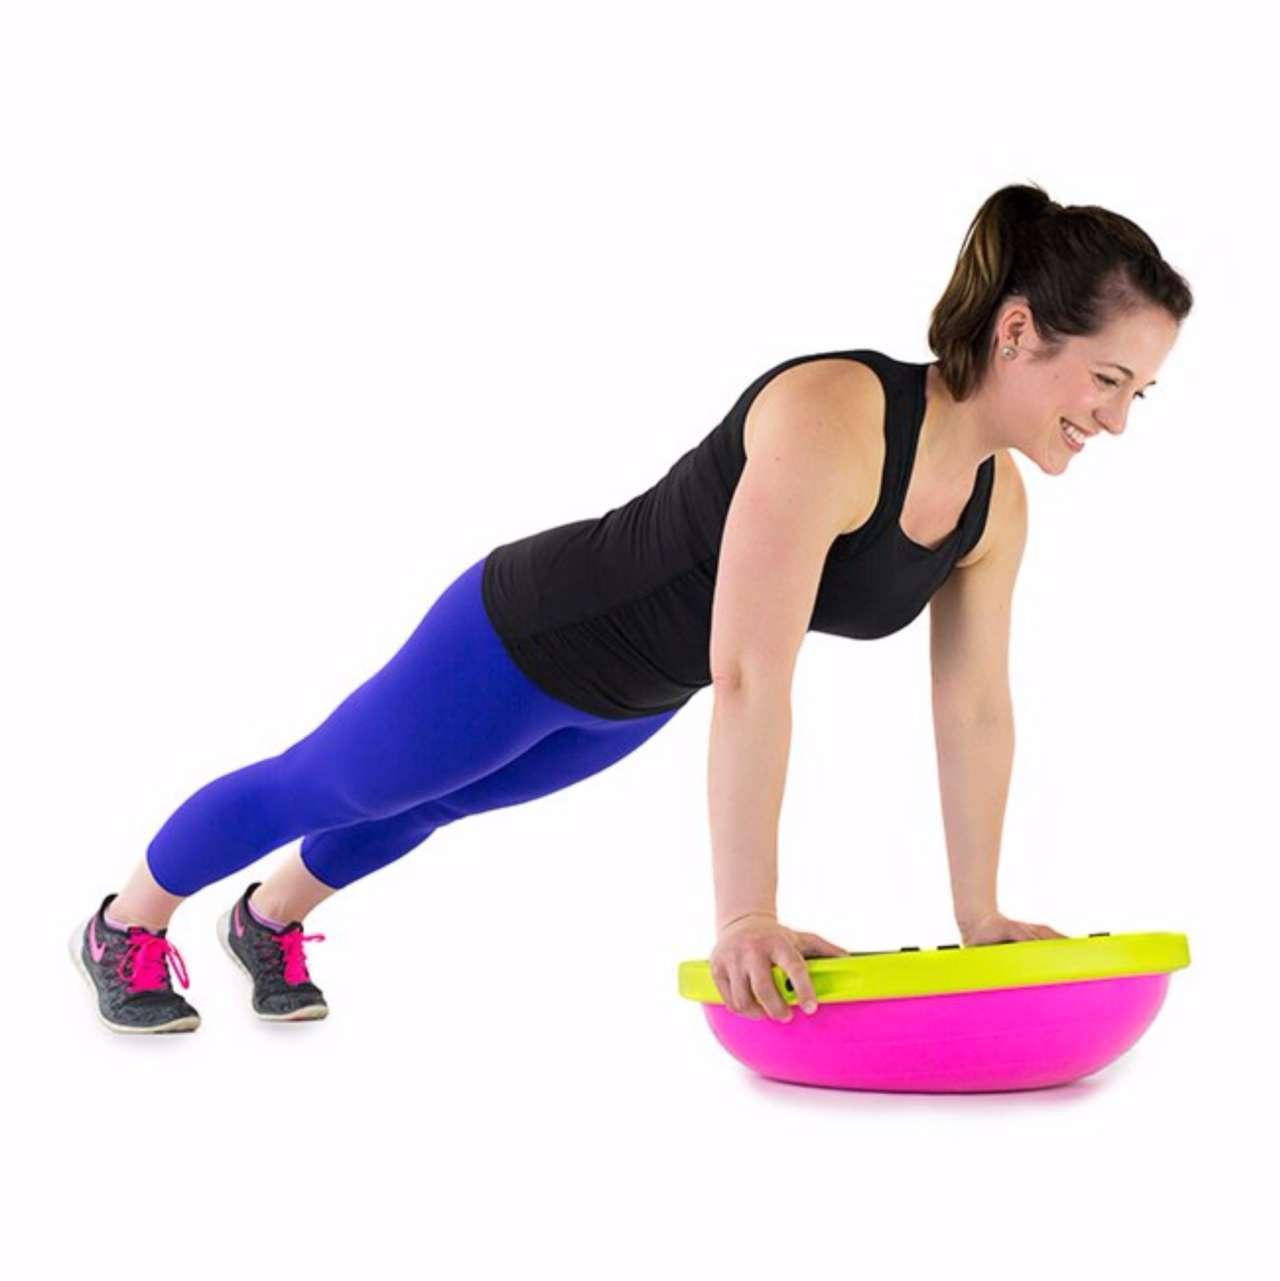 bosu-push-up-featured-1-52056-1280x0